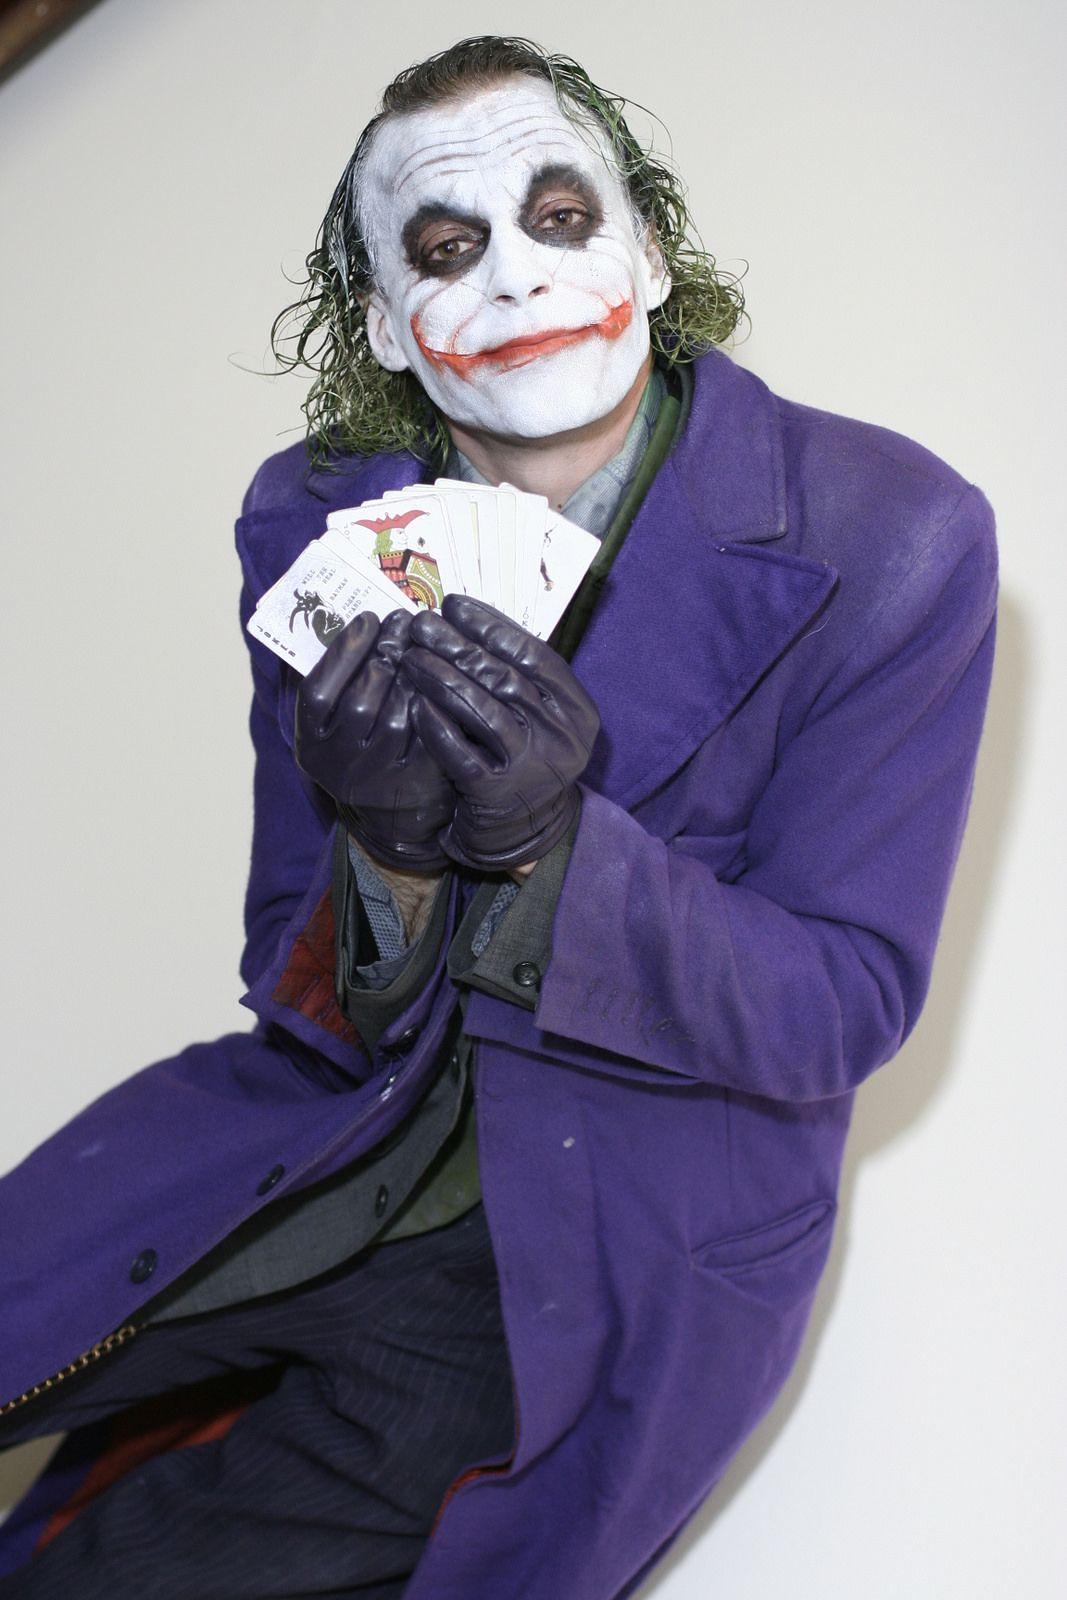 Marvel Superhero Joker Cosplay Heath Ledger Costume Outfits Halloween Warm Up